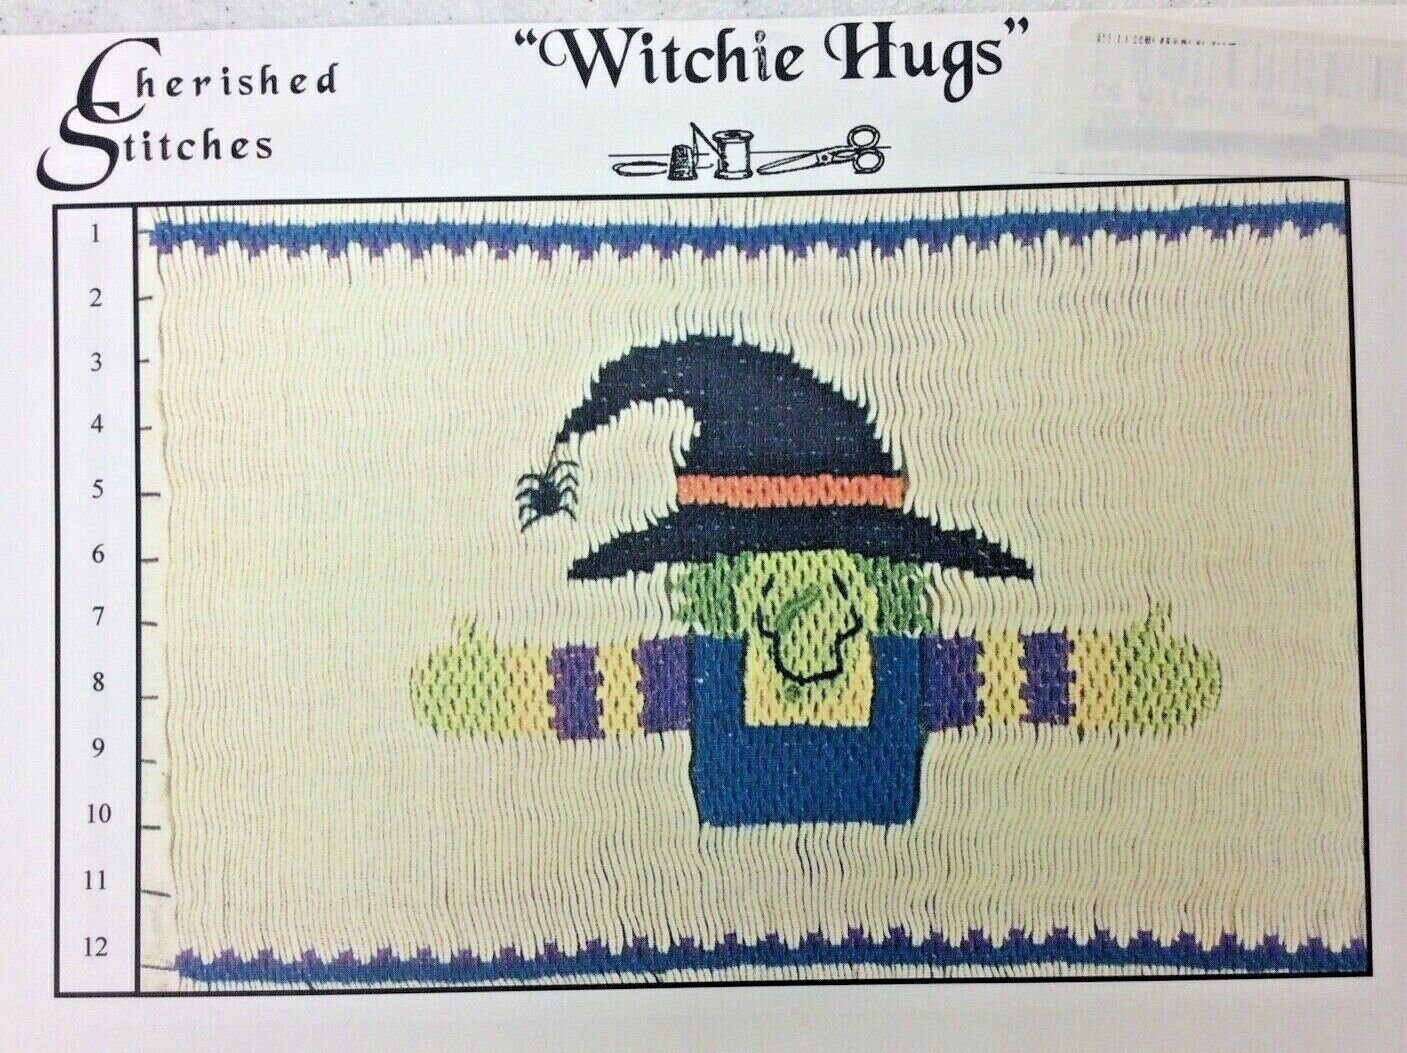 Witchie Hugs